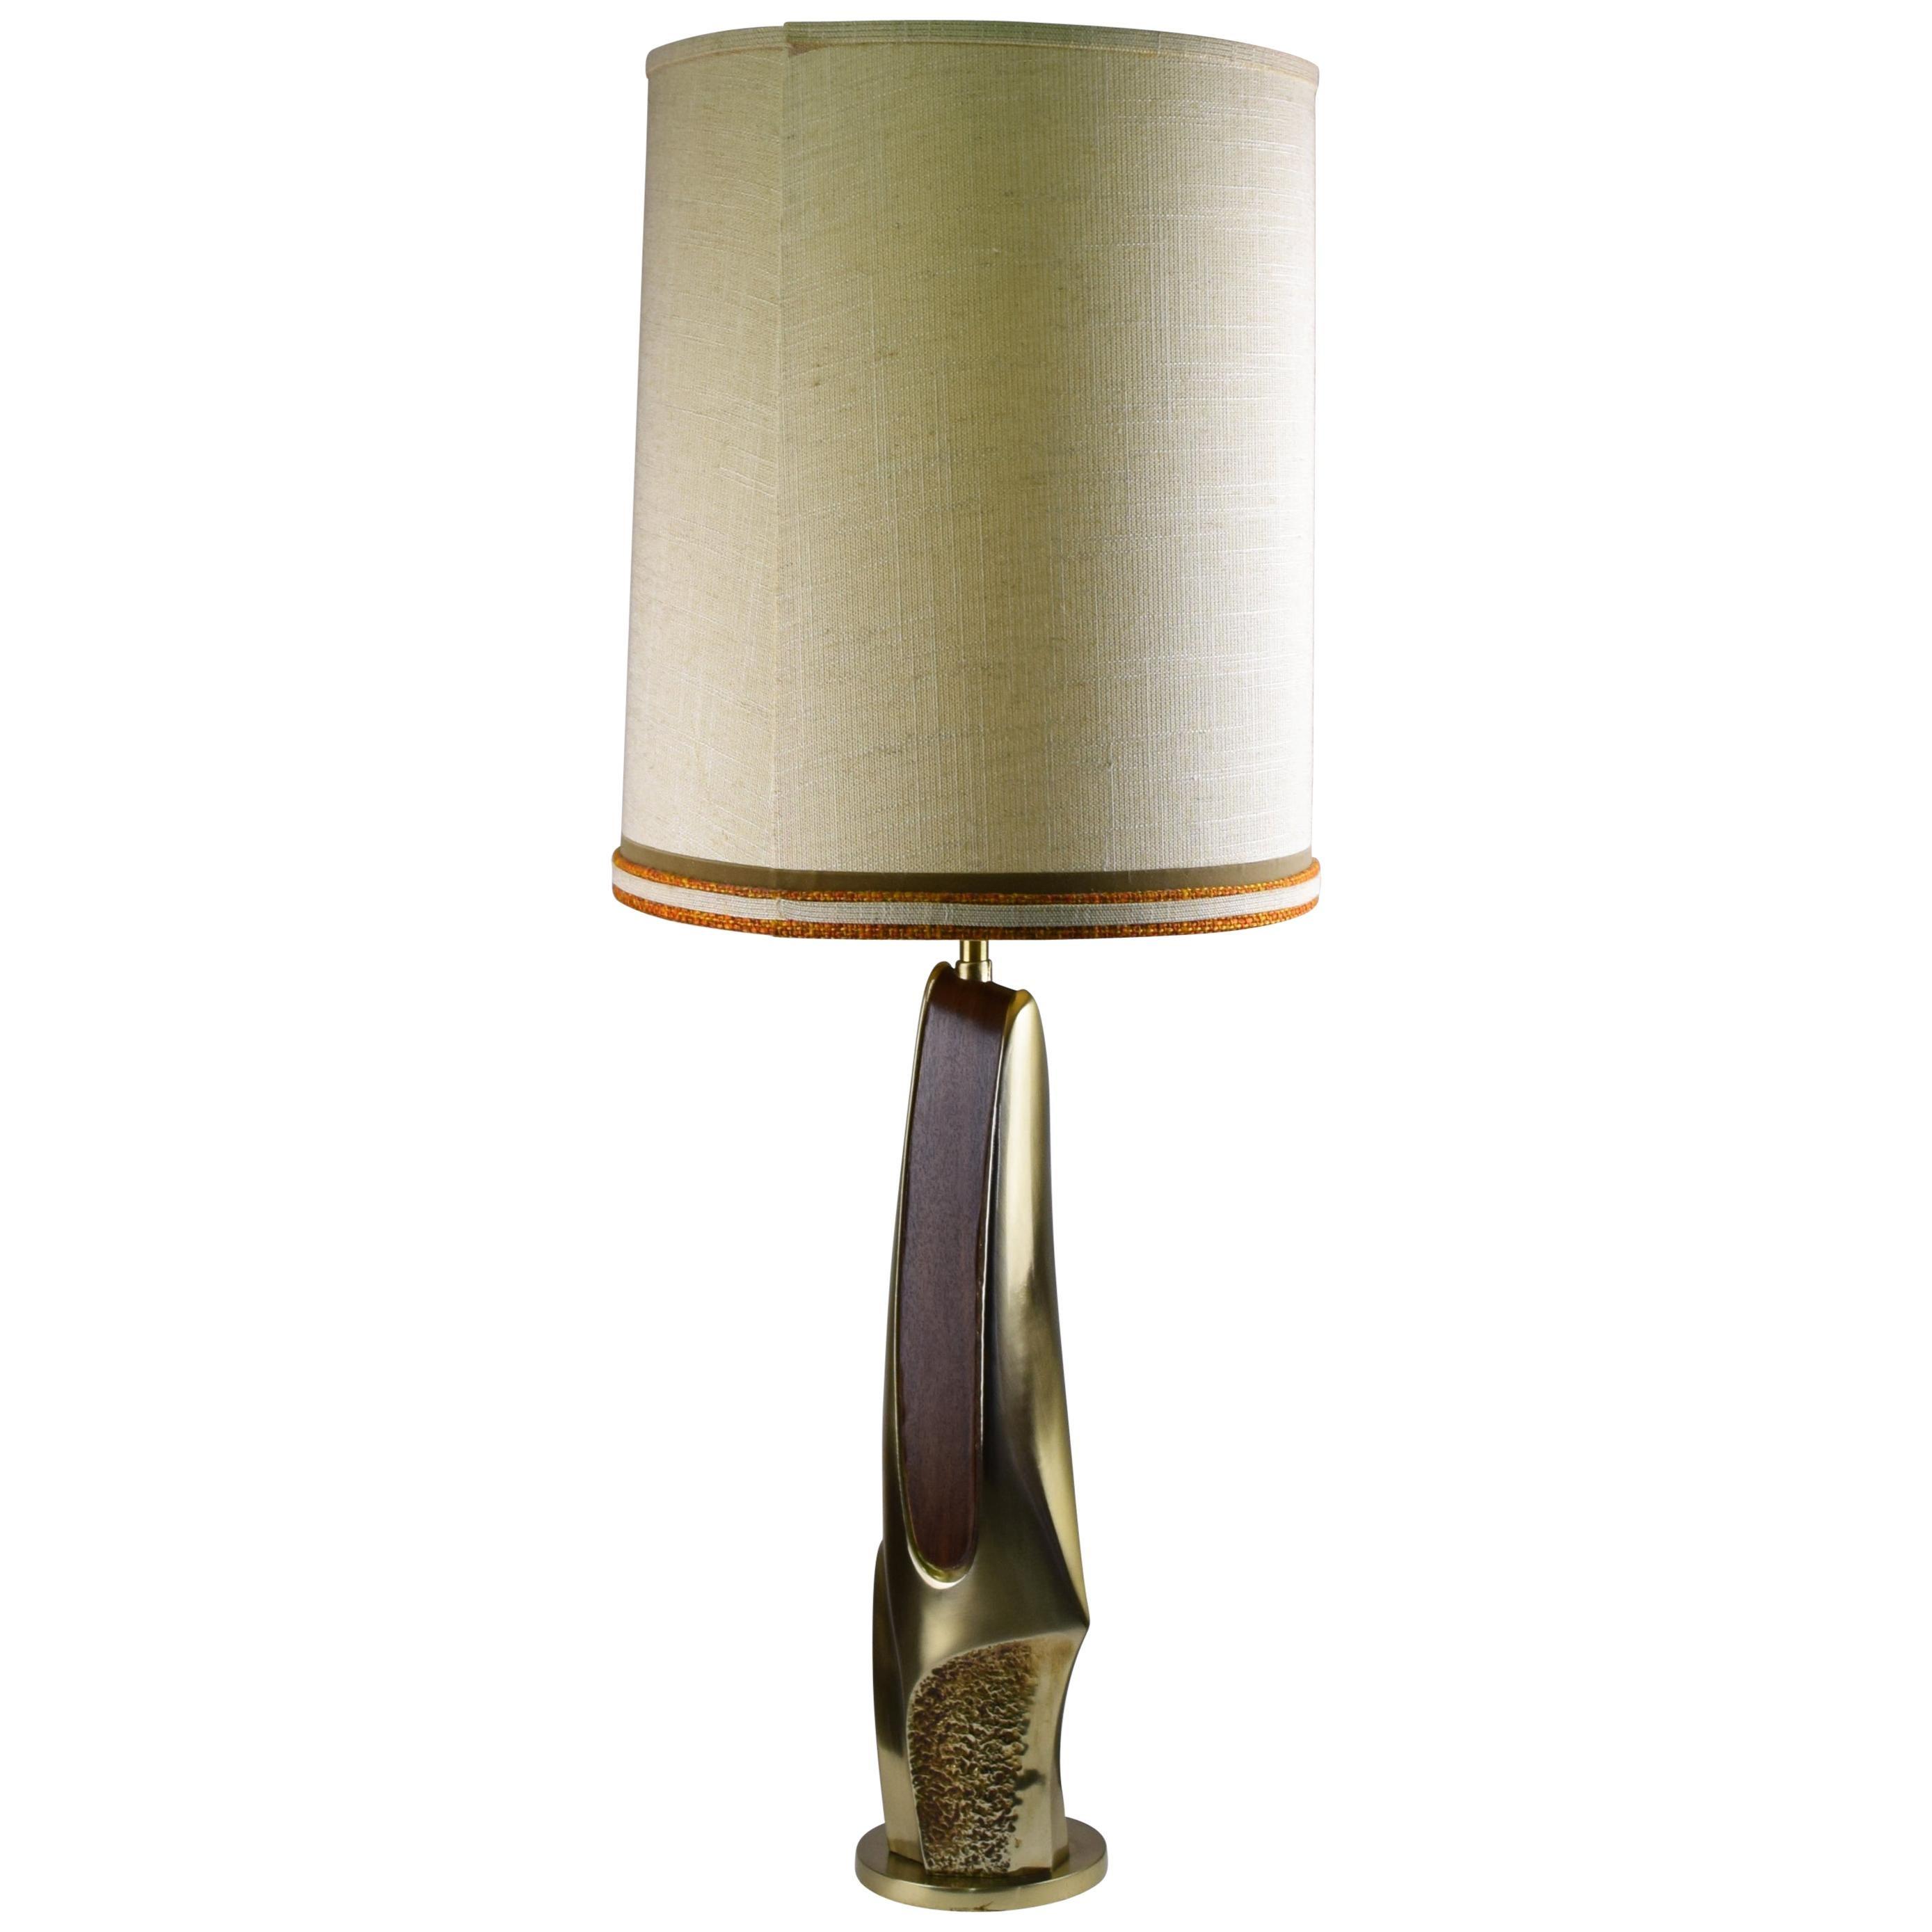 Sculptural Abstract Cast Brass Table Lamp Laurel Lighting